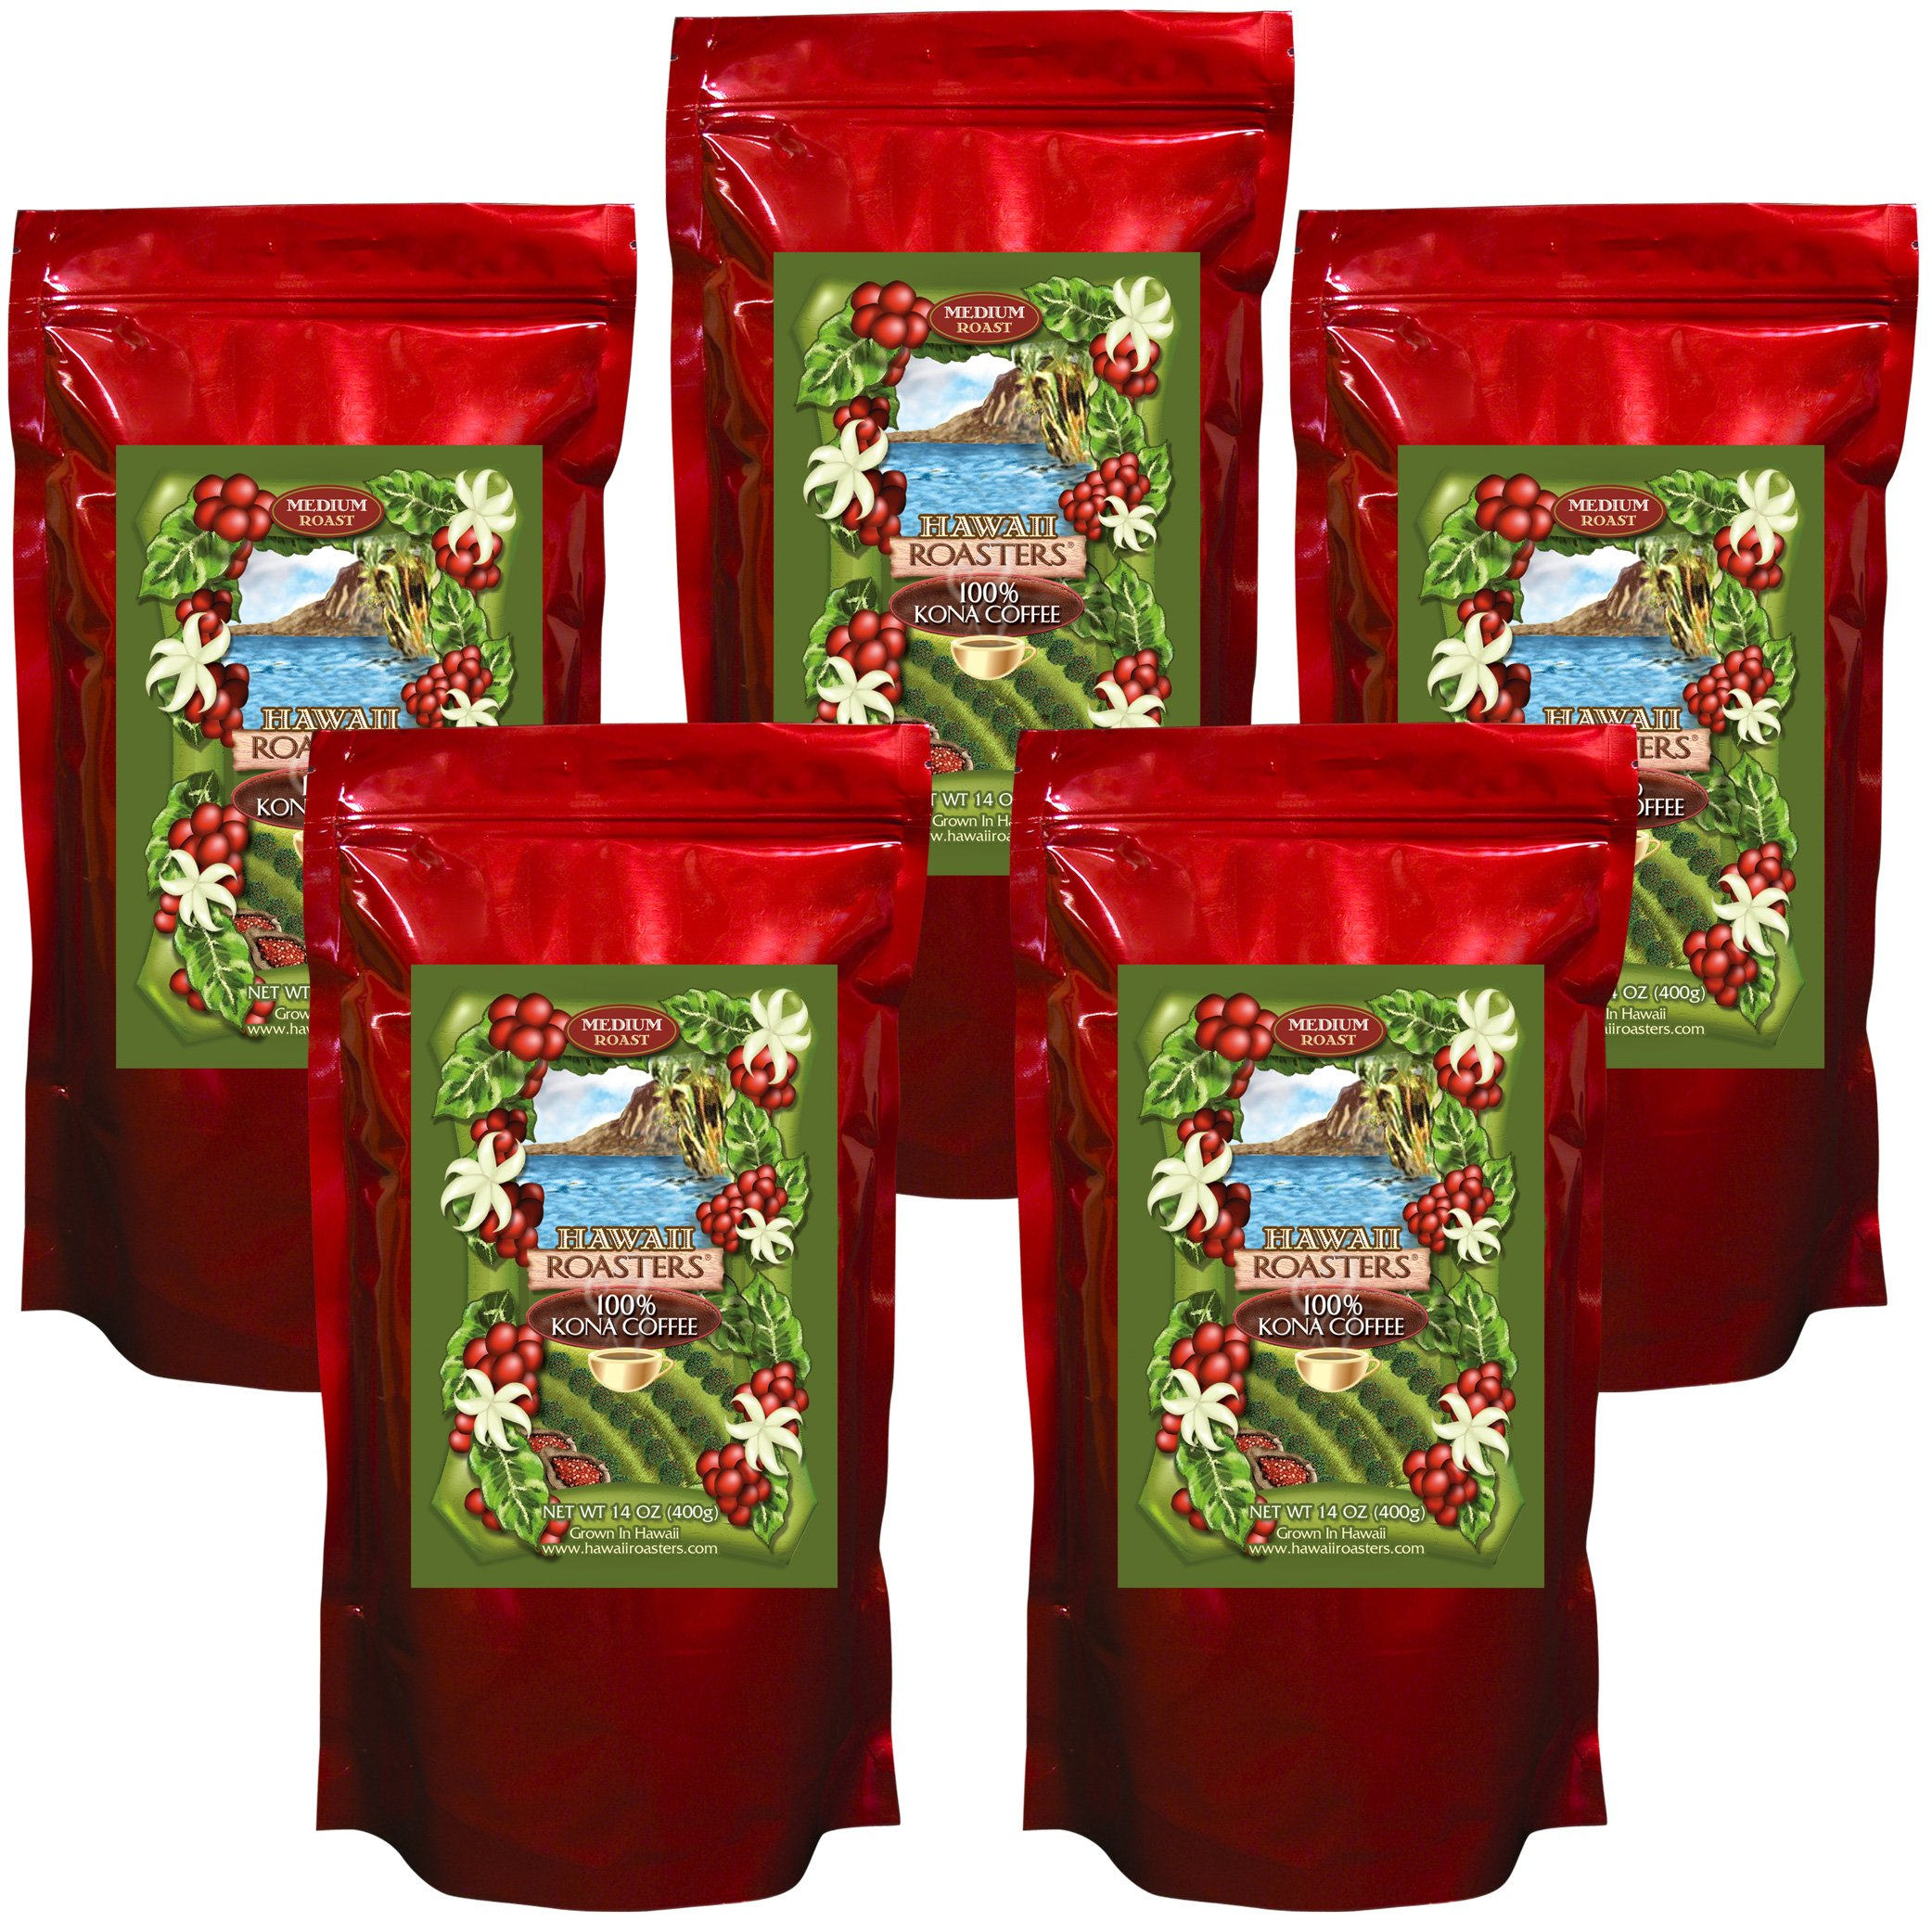 Hawaii Roasters 100% Kona Coffee, Medium Roast, Whole Bean, 5 14-Ounce Bag